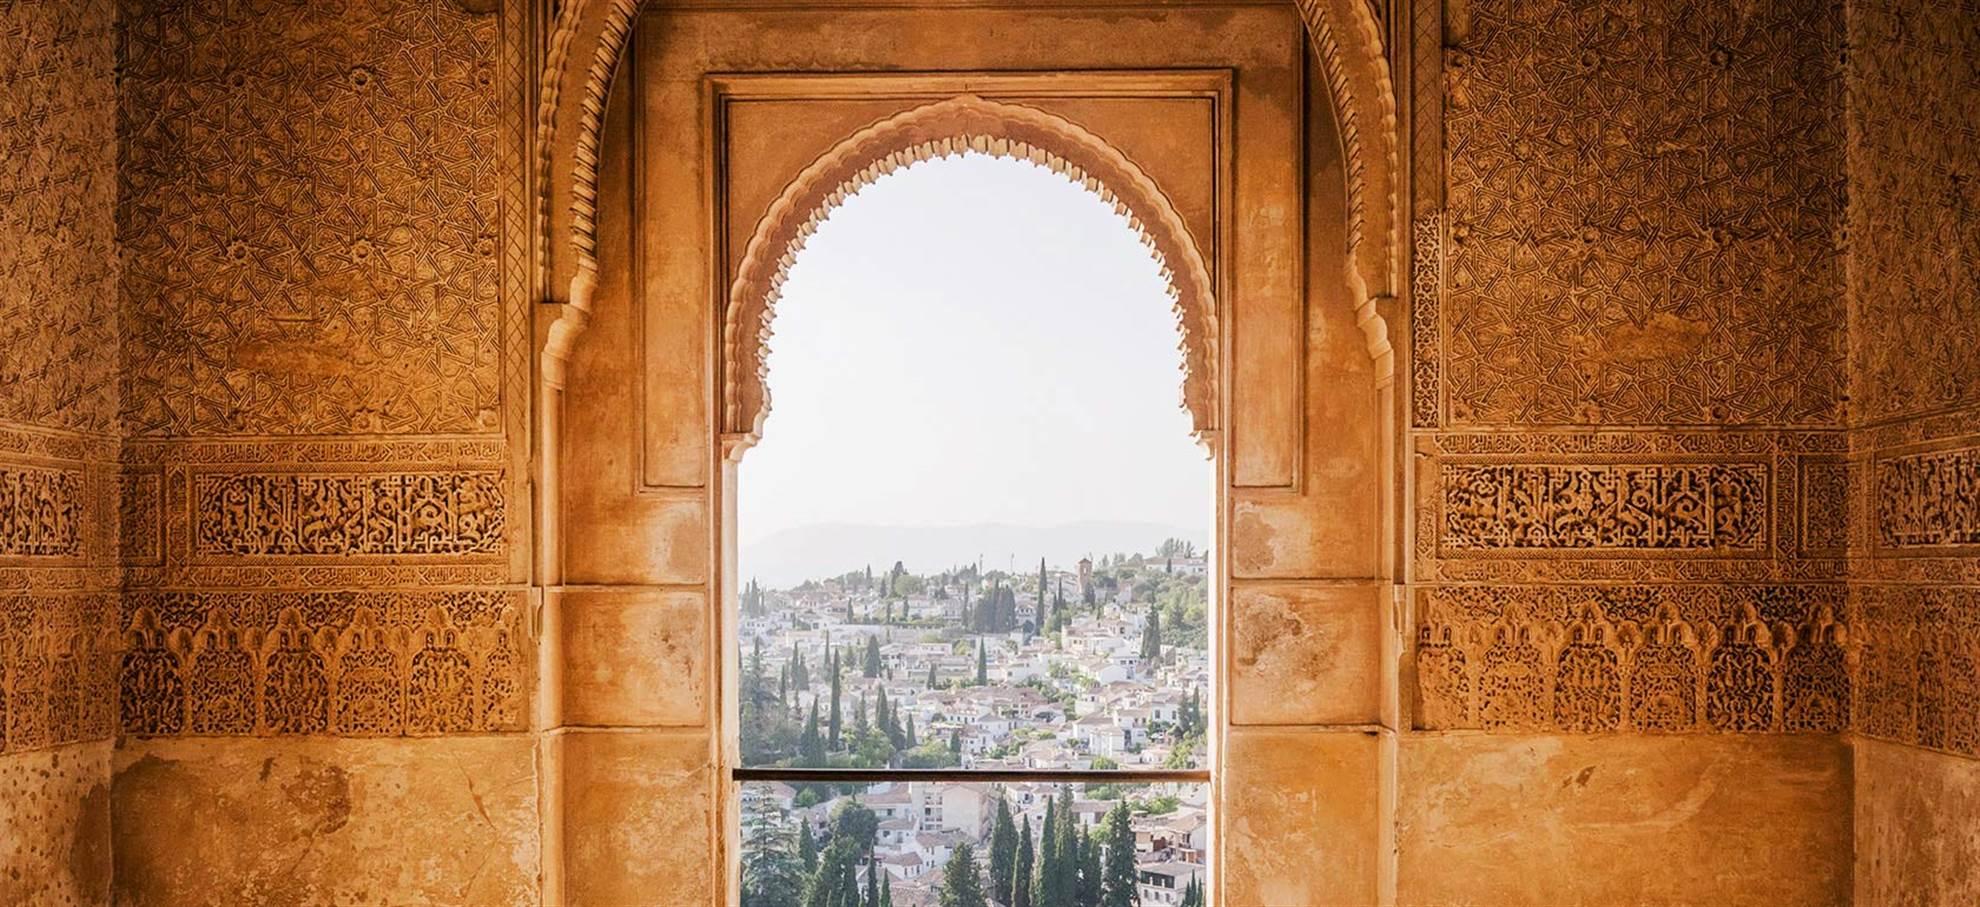 Alhambra Card - Skip the line entrance!